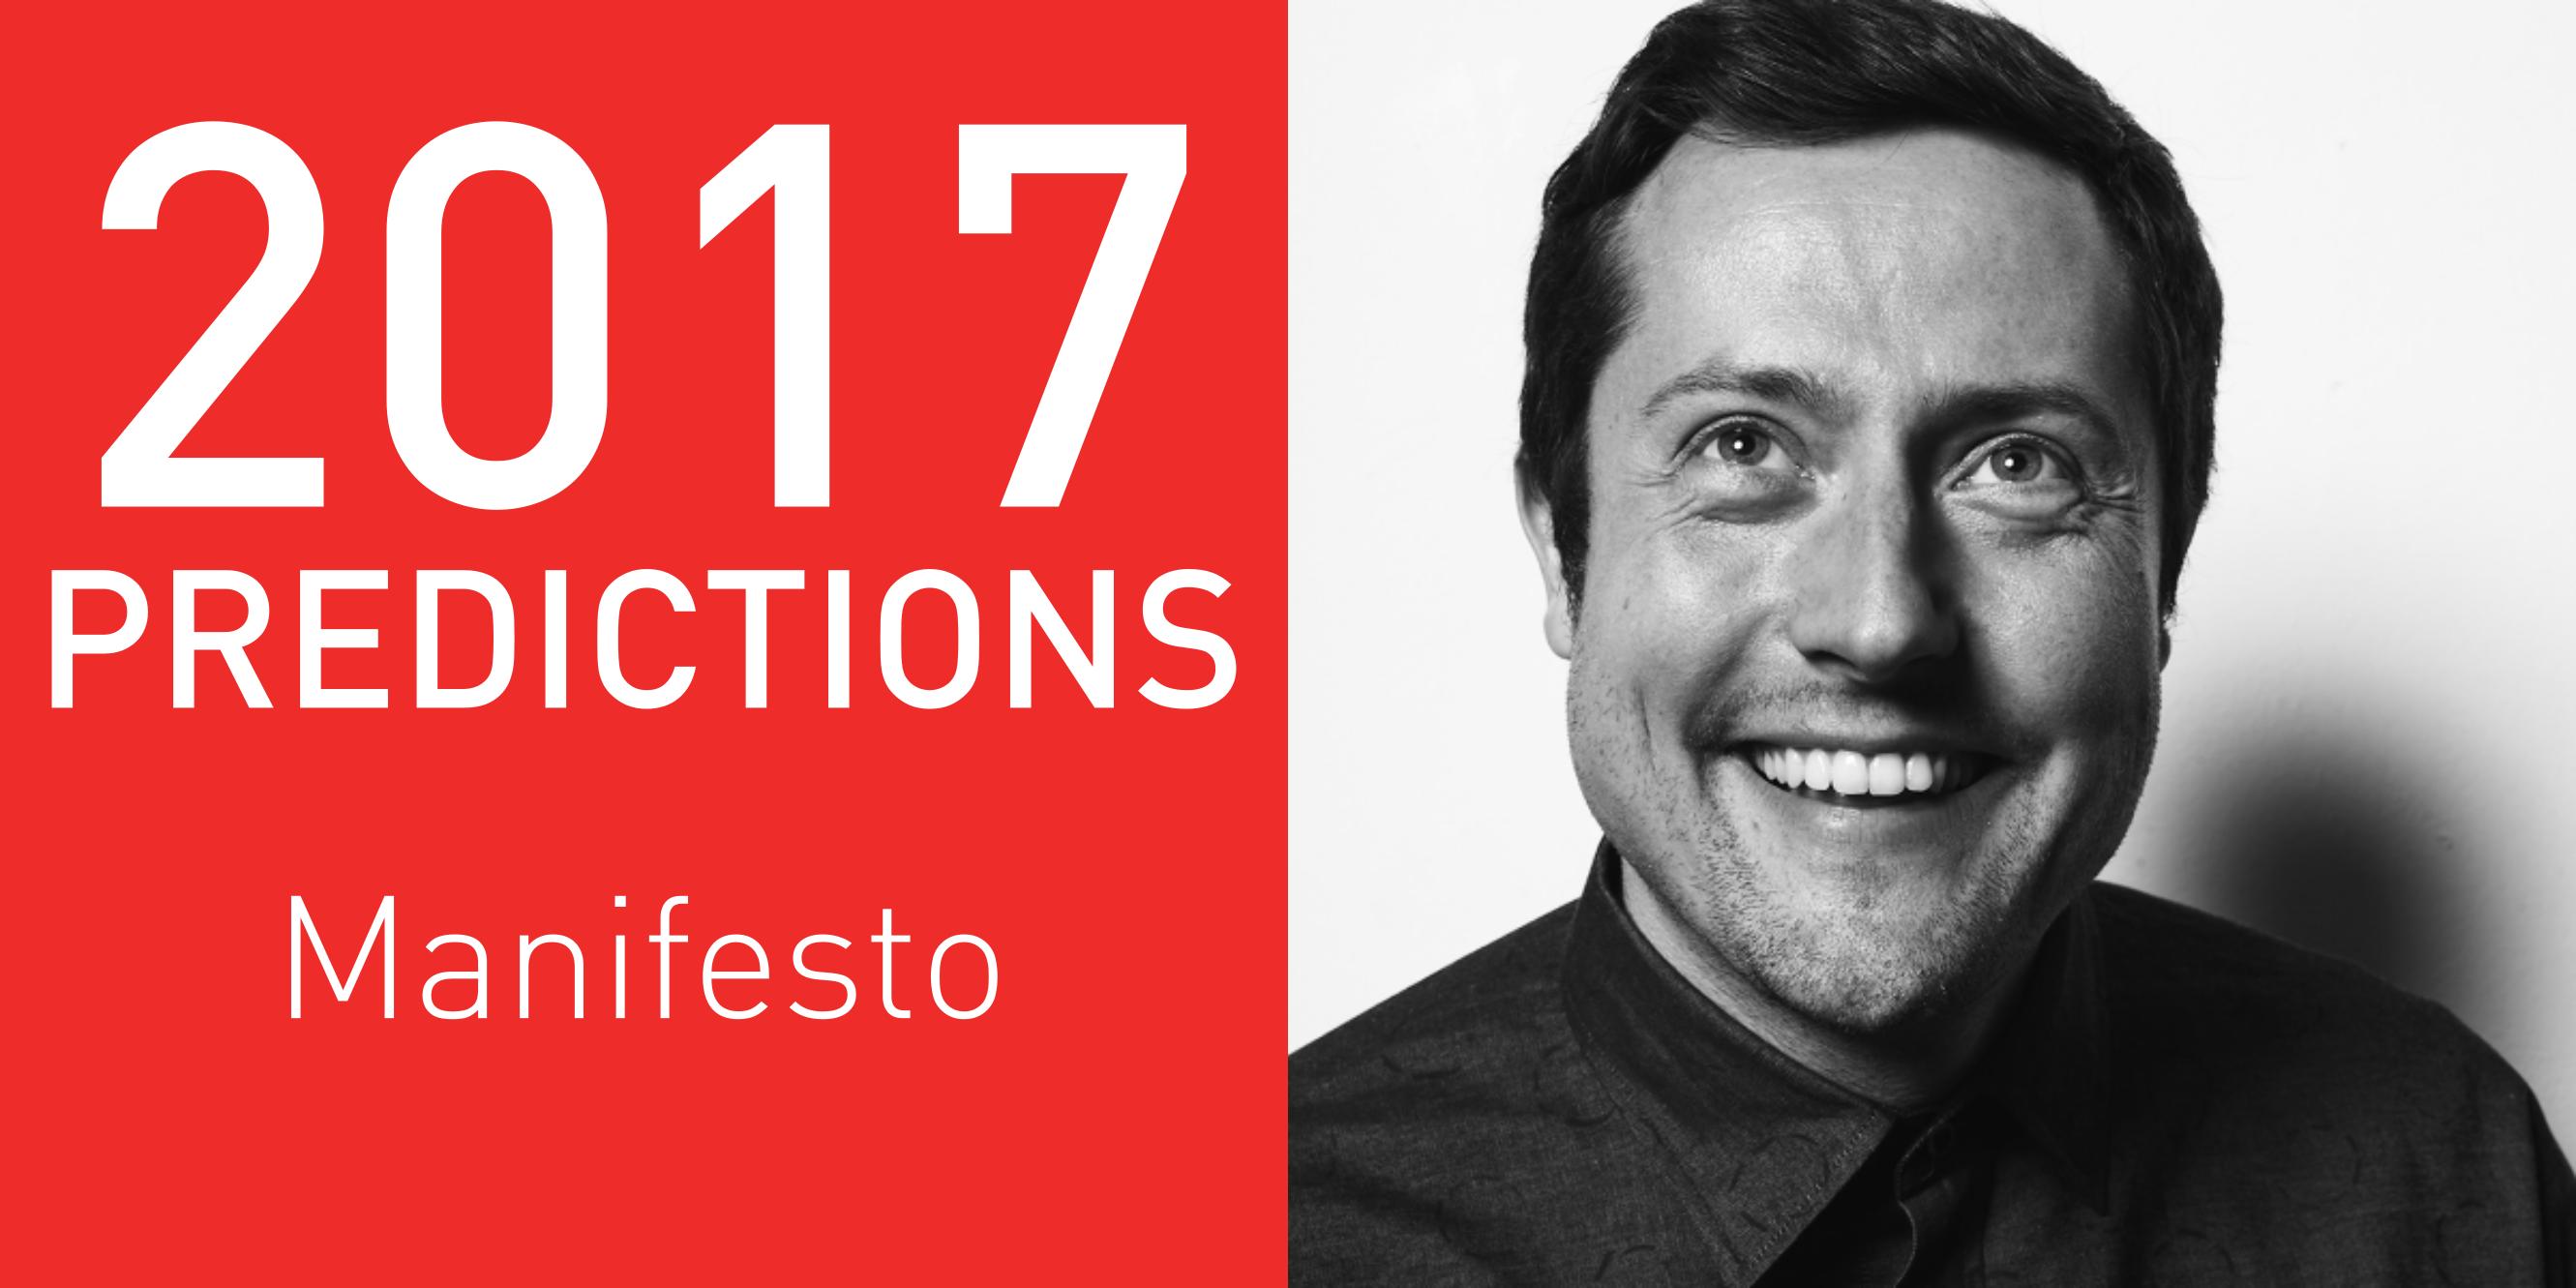 2017 predictions Manifesto